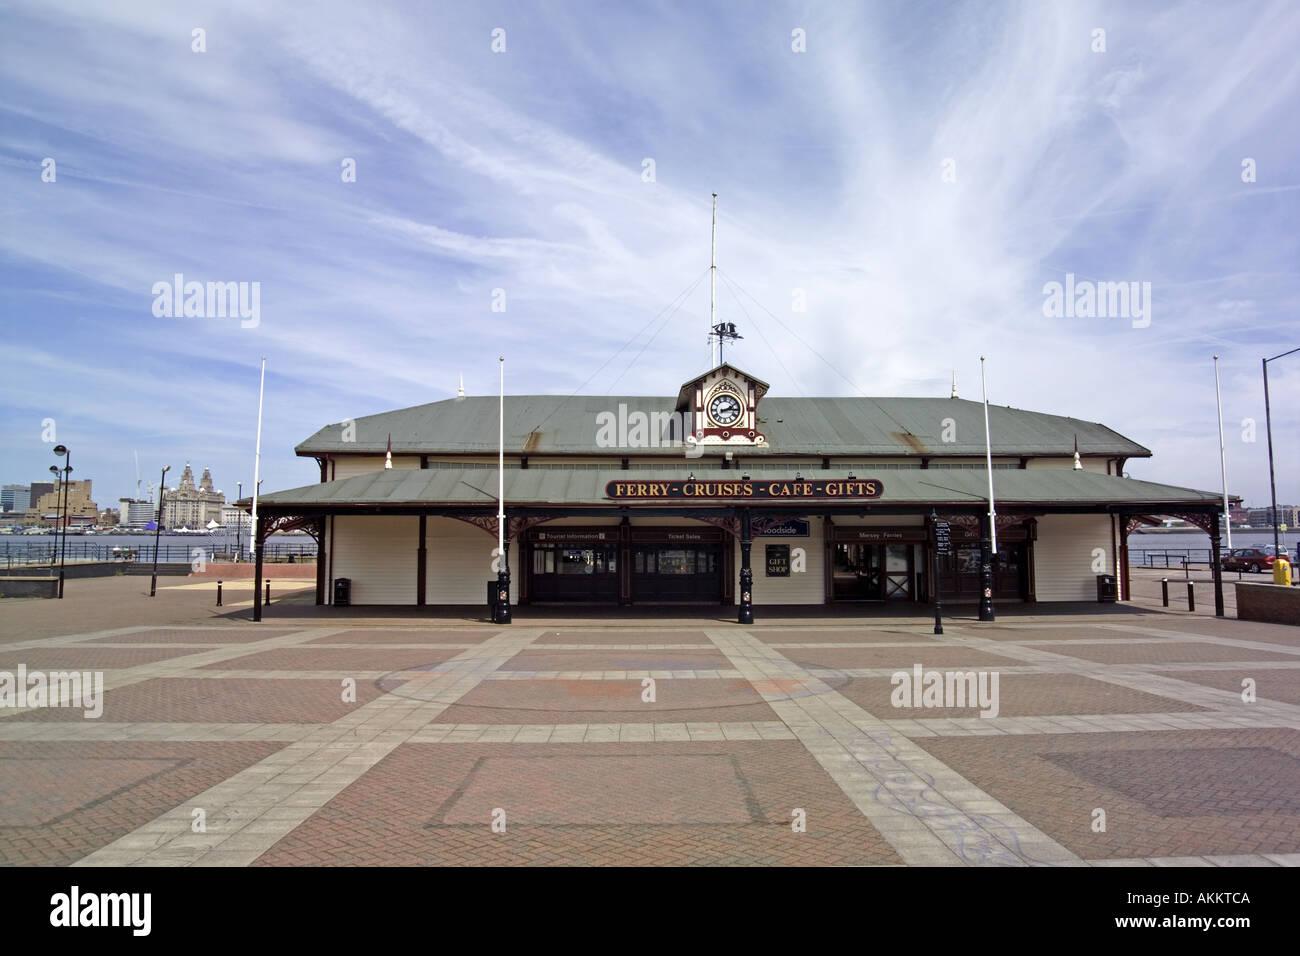 Woodside Ferry Terminal Building Birkenhead Merseyside Wirral UK England liverpool - Stock Image